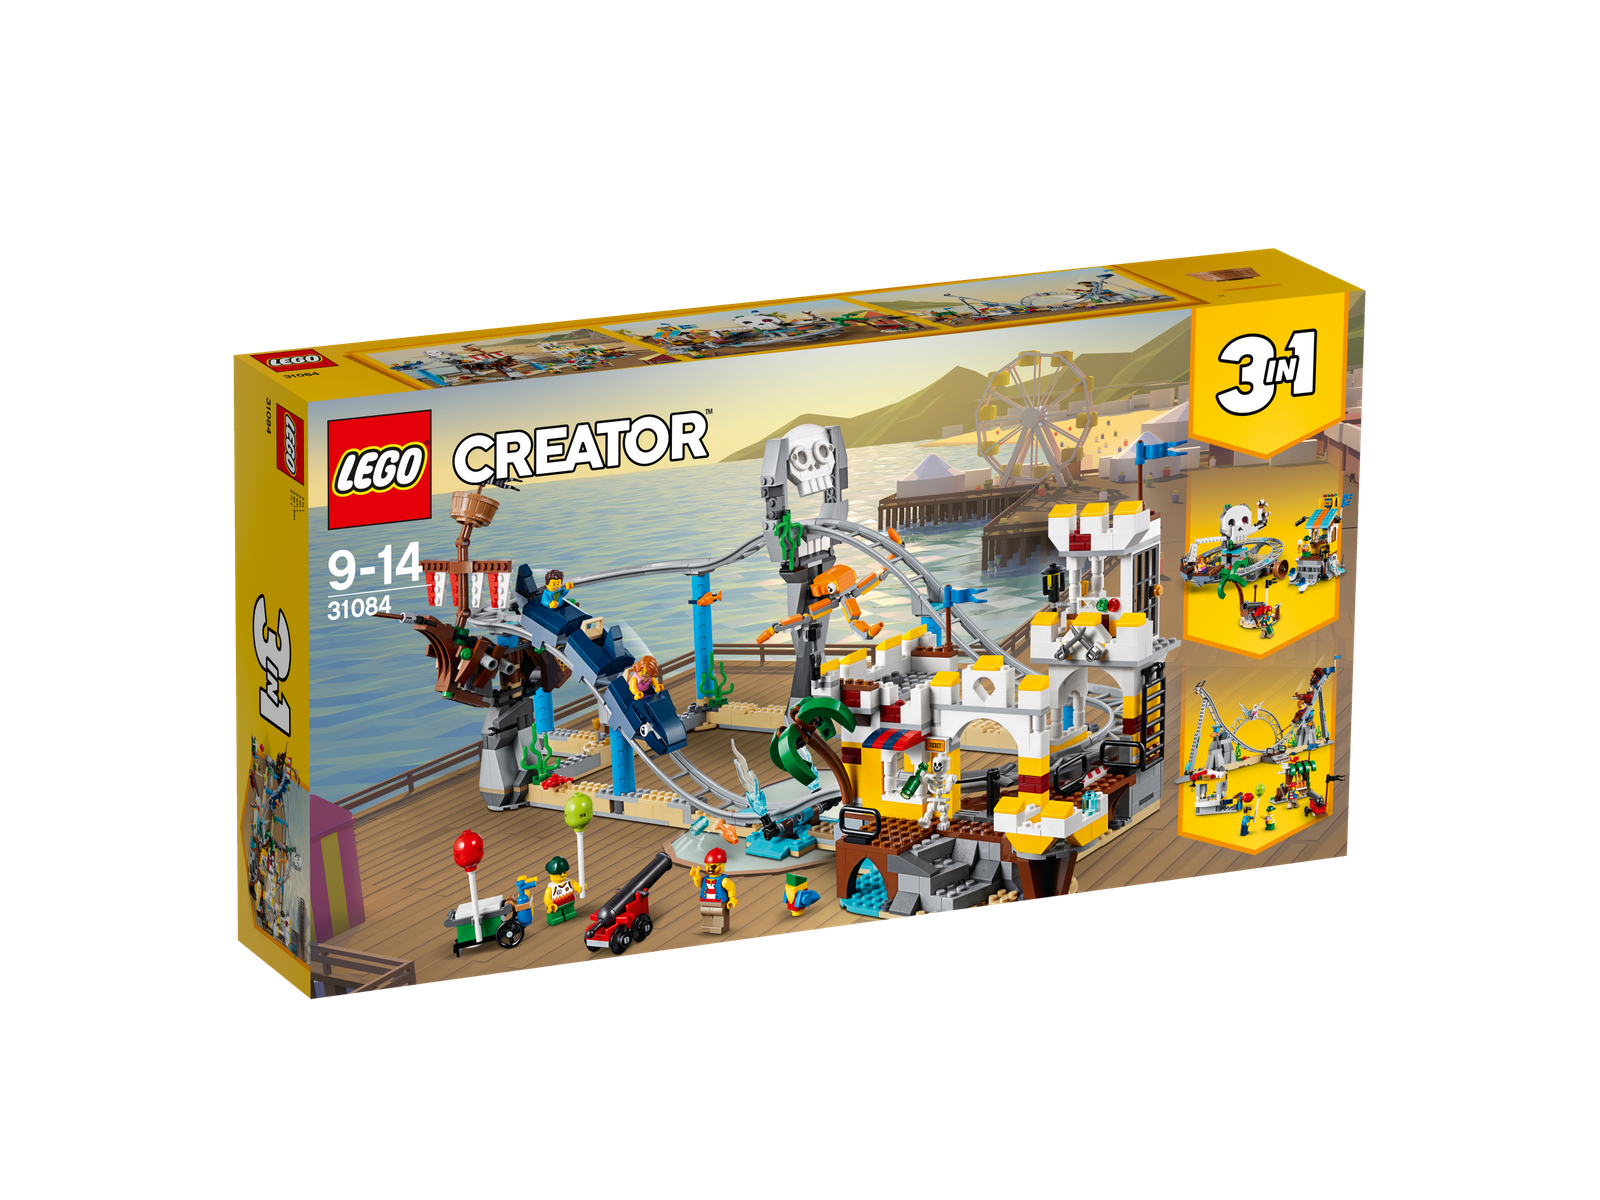 LEGO ® Creator 31084-pirati sulle montagne russe NUOVO OVP _ Pirate Roller Coaster NEW MISB